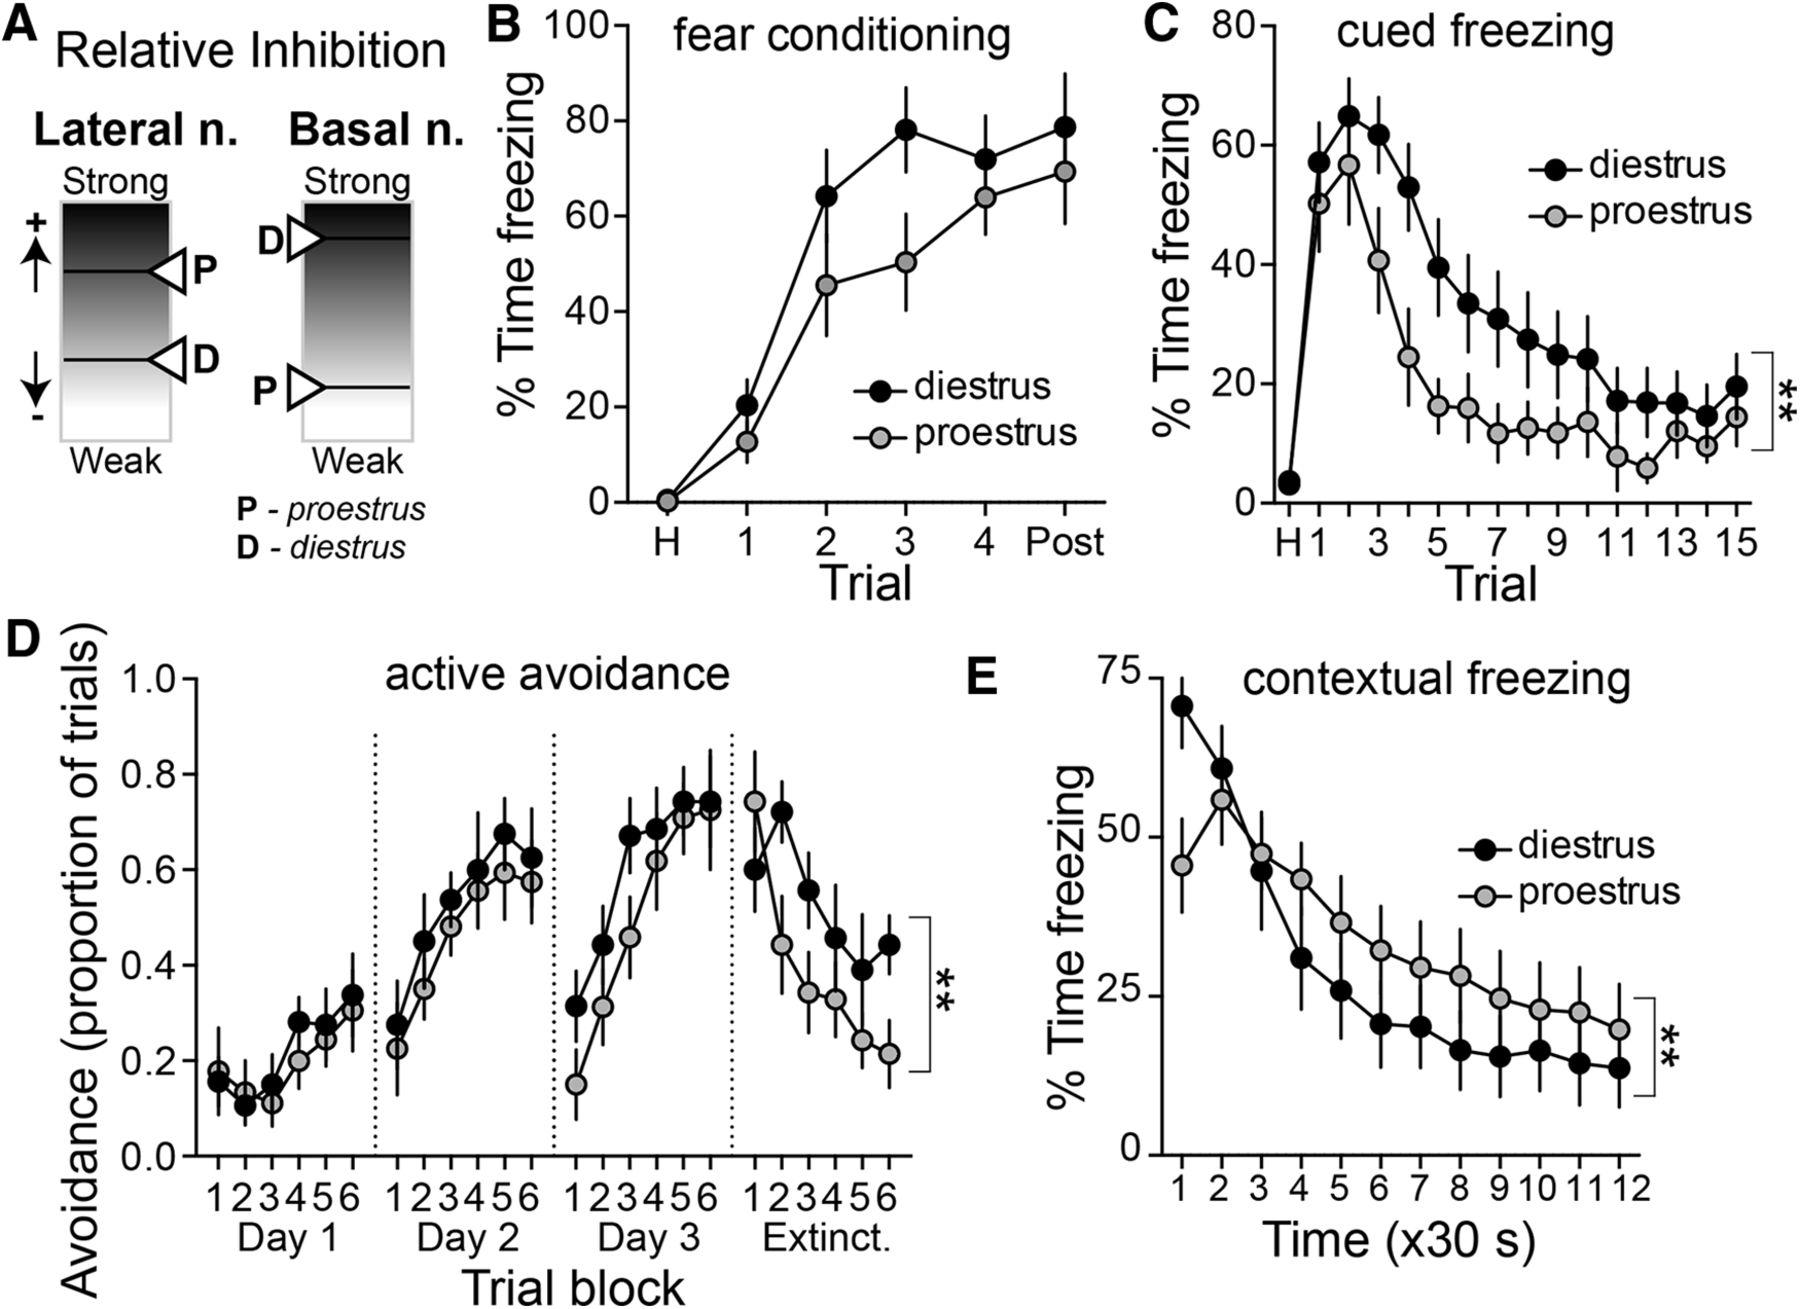 medium resolution of sex and estrus dependent differences in rat basolateral amygdala journal of neuroscience